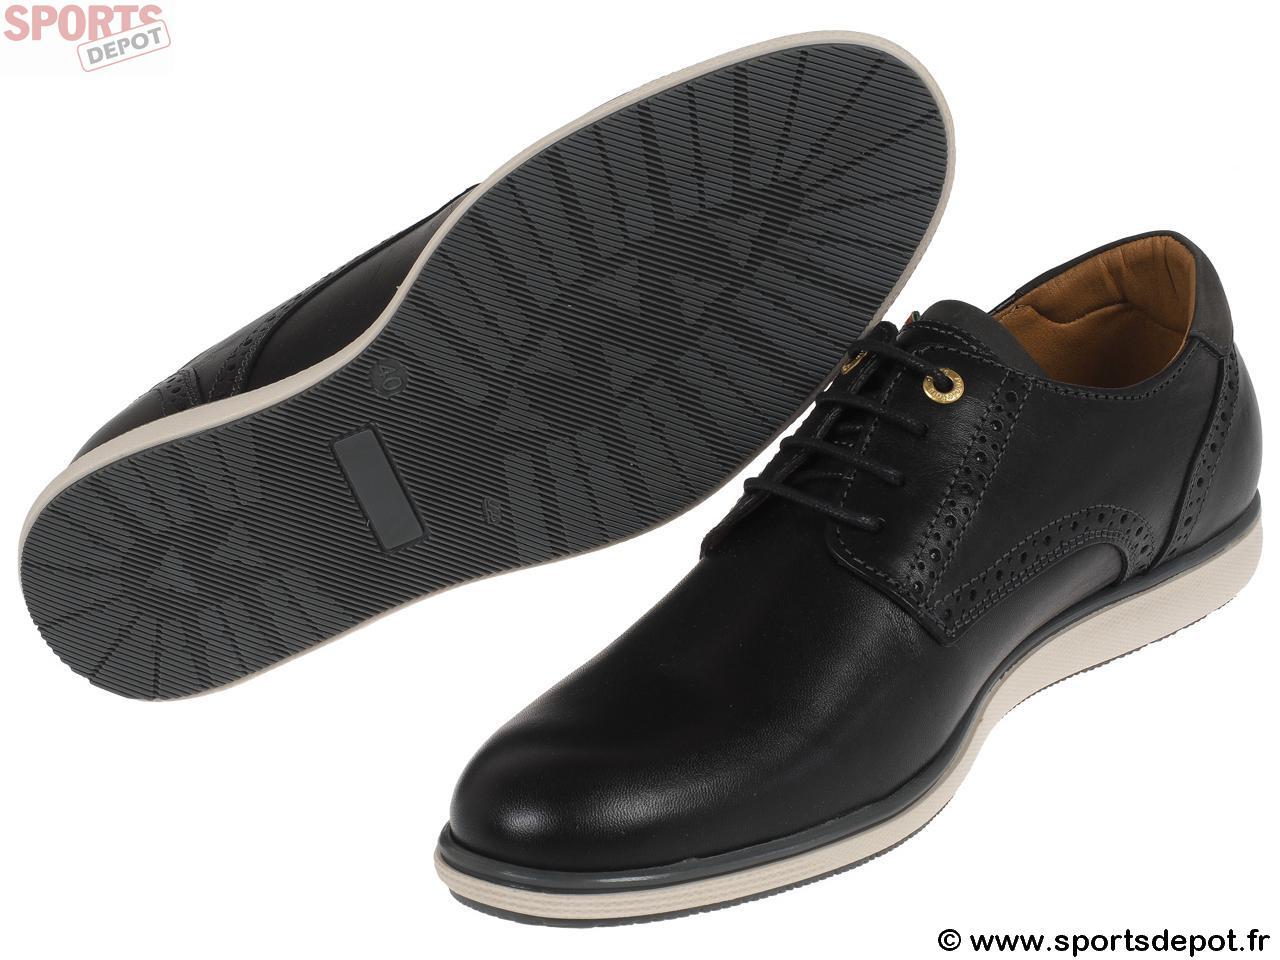 simili uomo ou Sangro Chaussures low Acheter cuir basses PANTOFOLA qOwIS